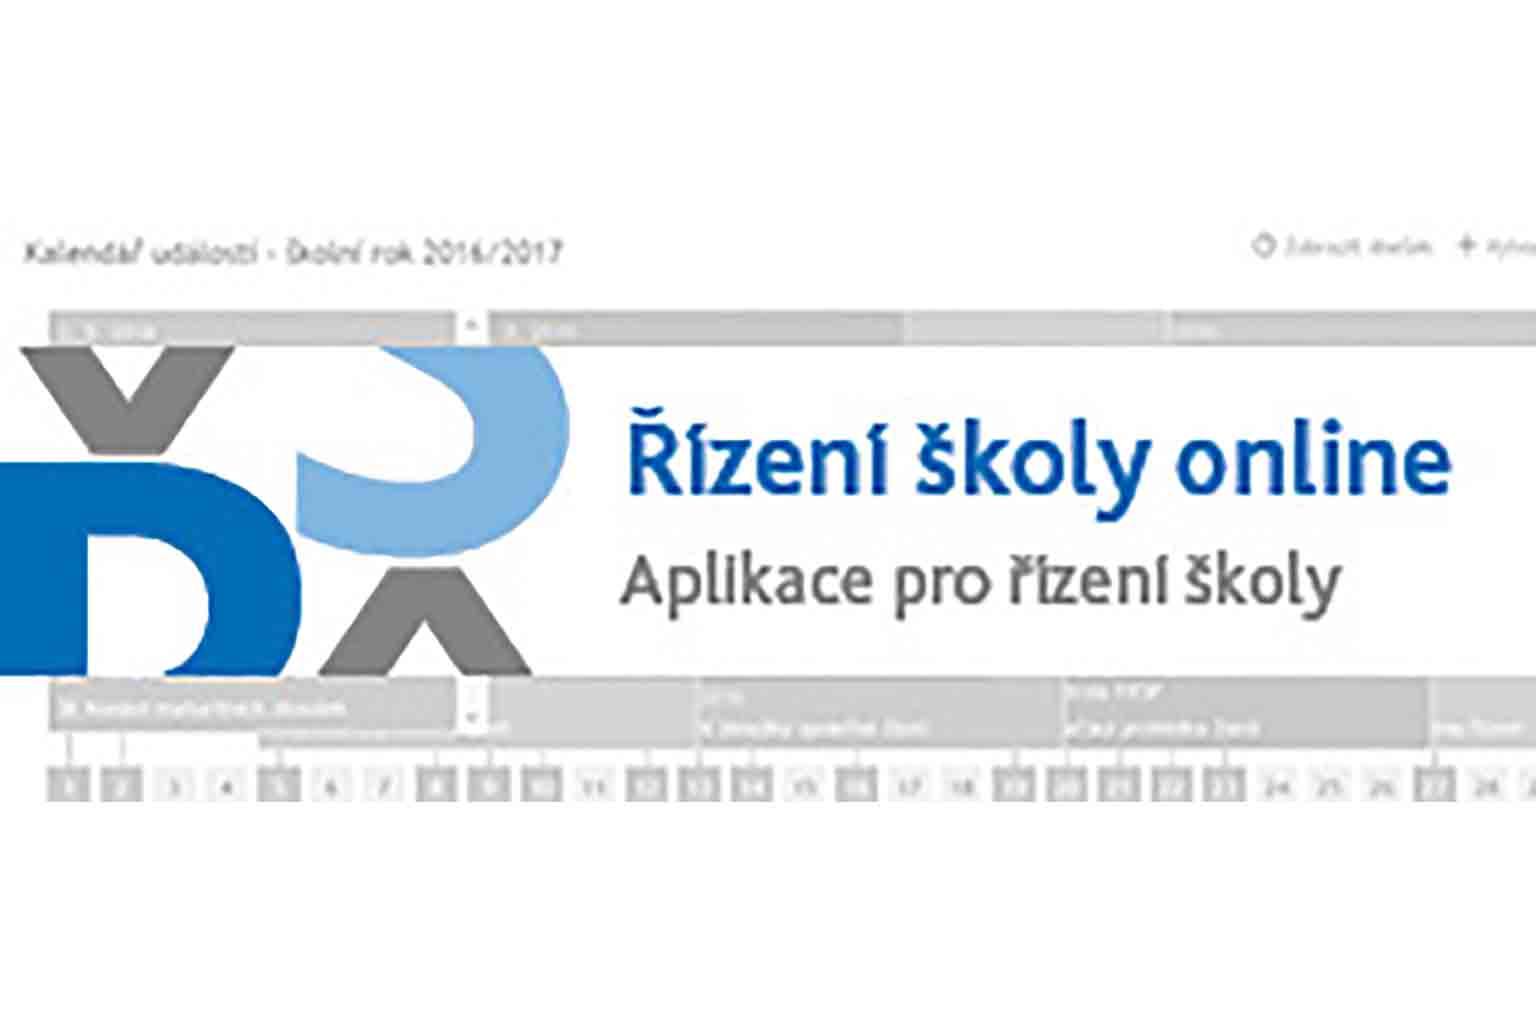 rizeni-skoly-online